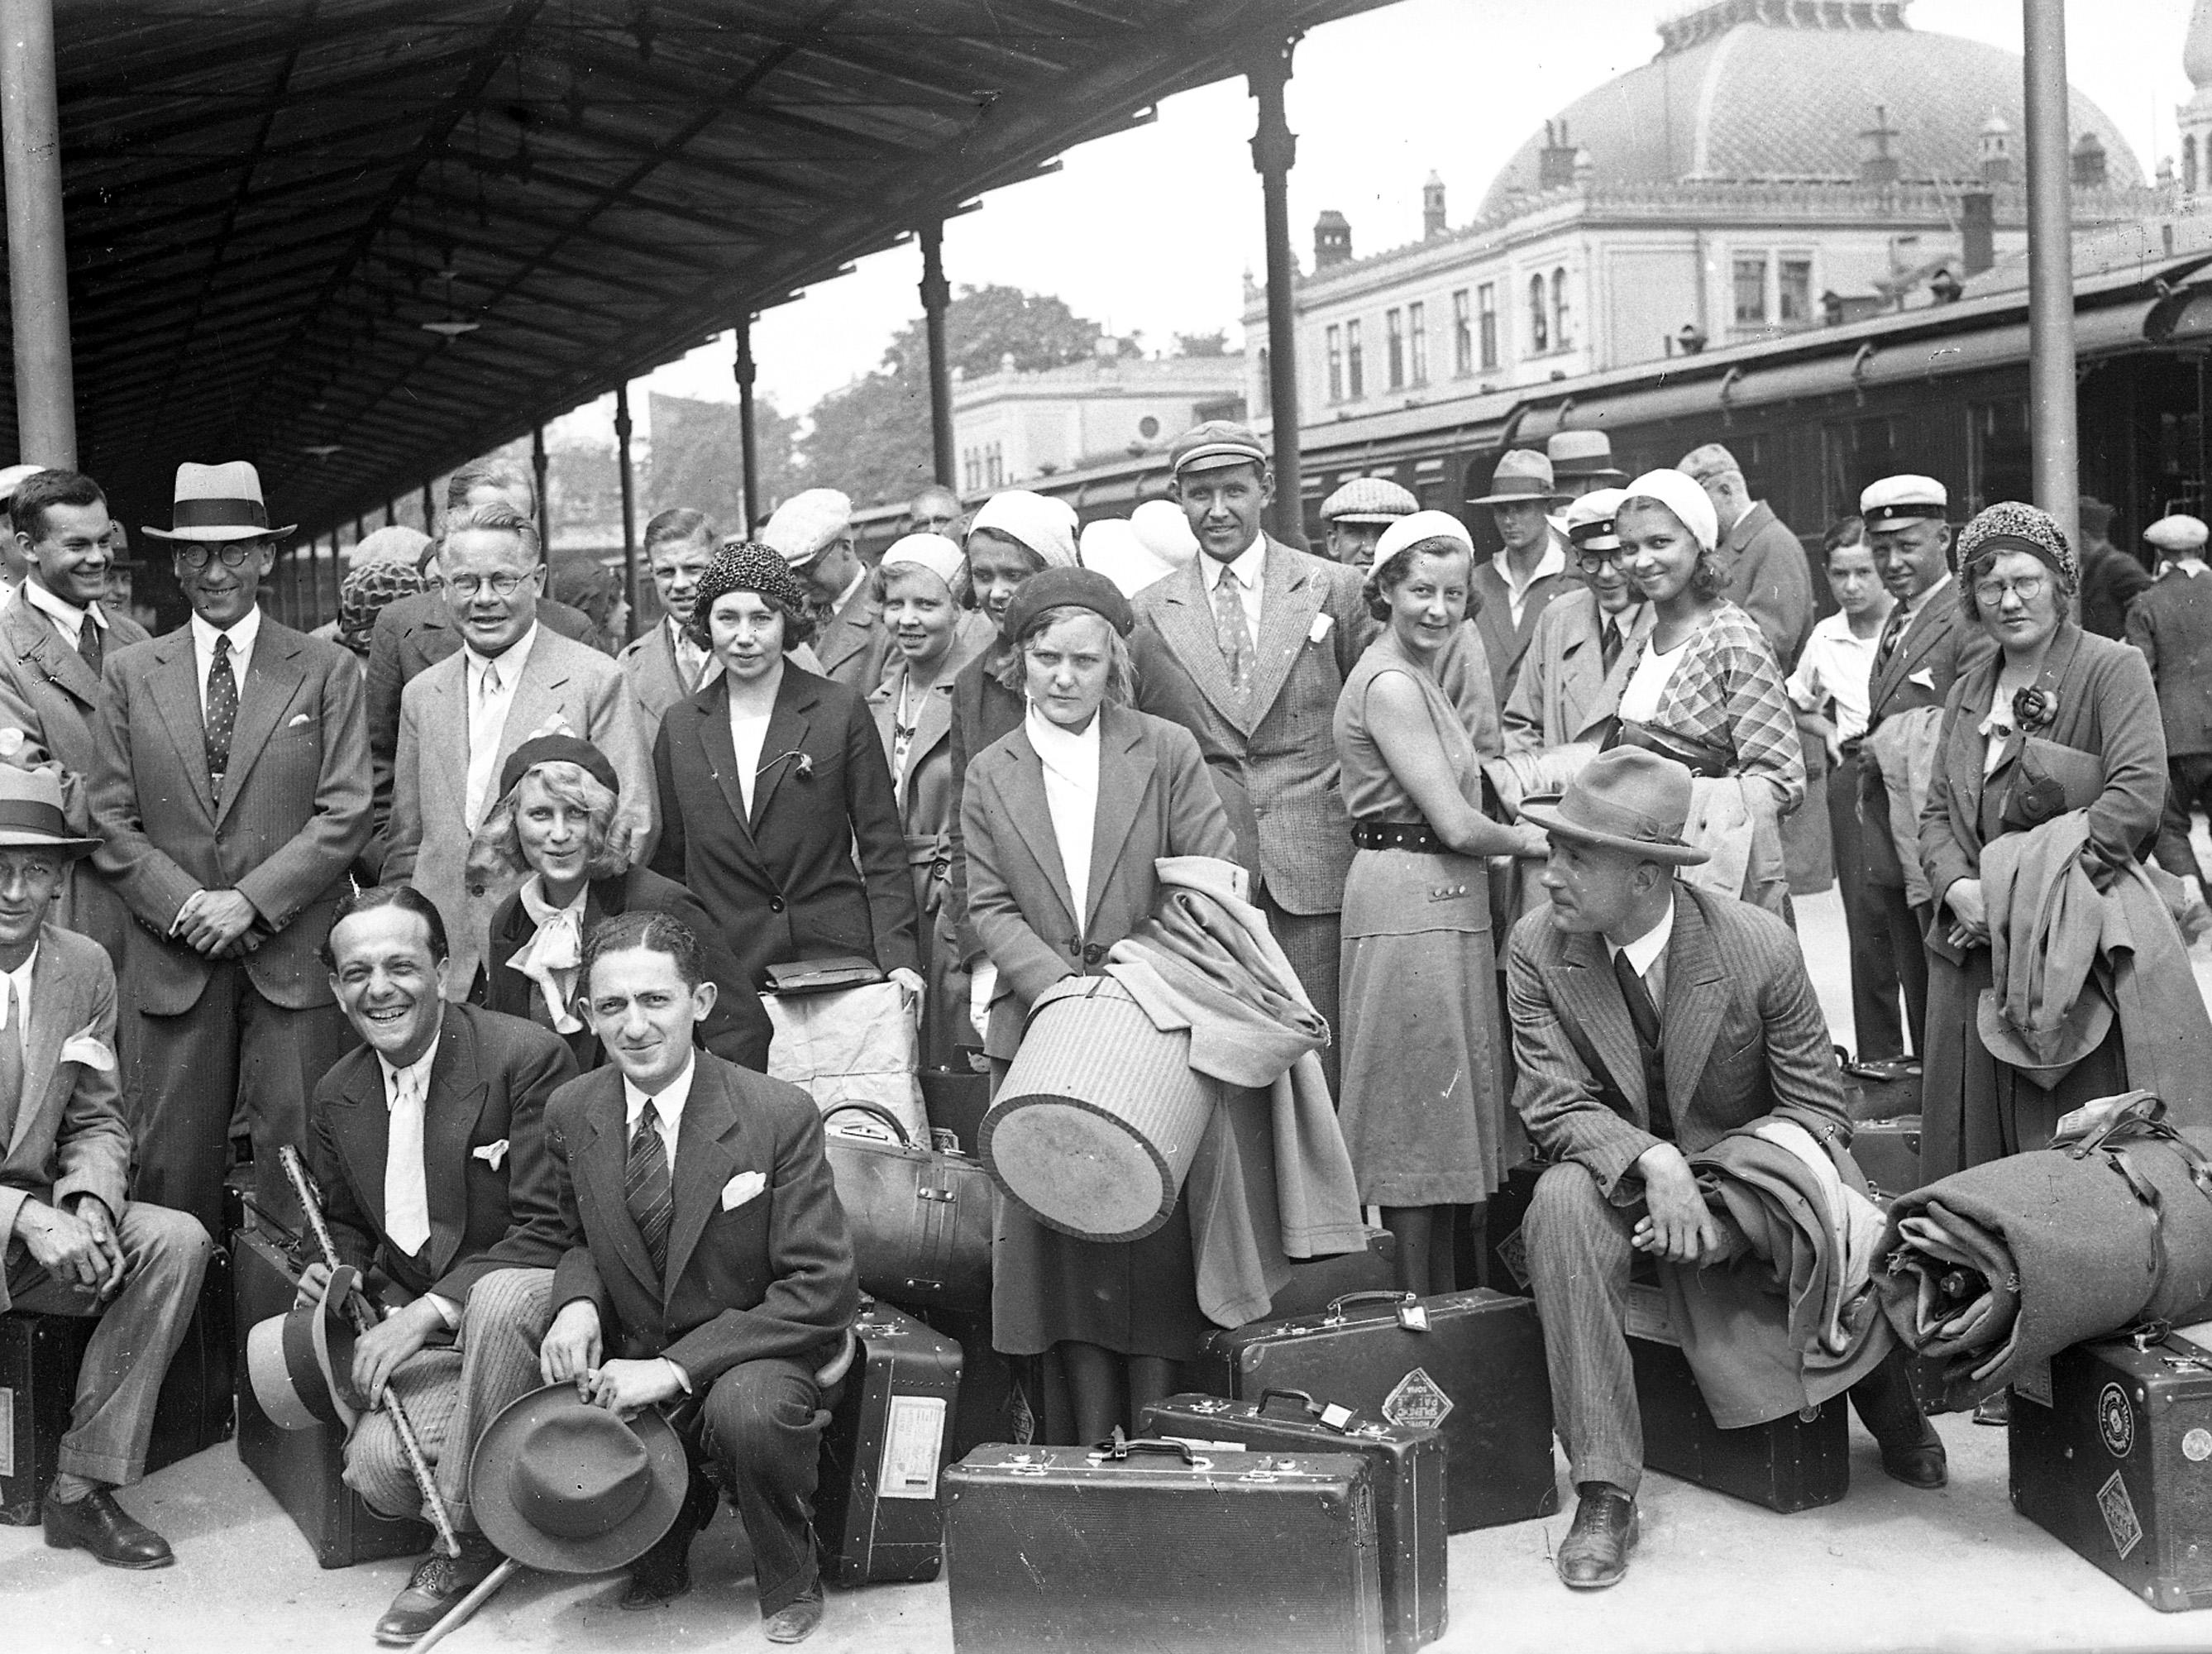 Passengers at Sirkeci Train Station